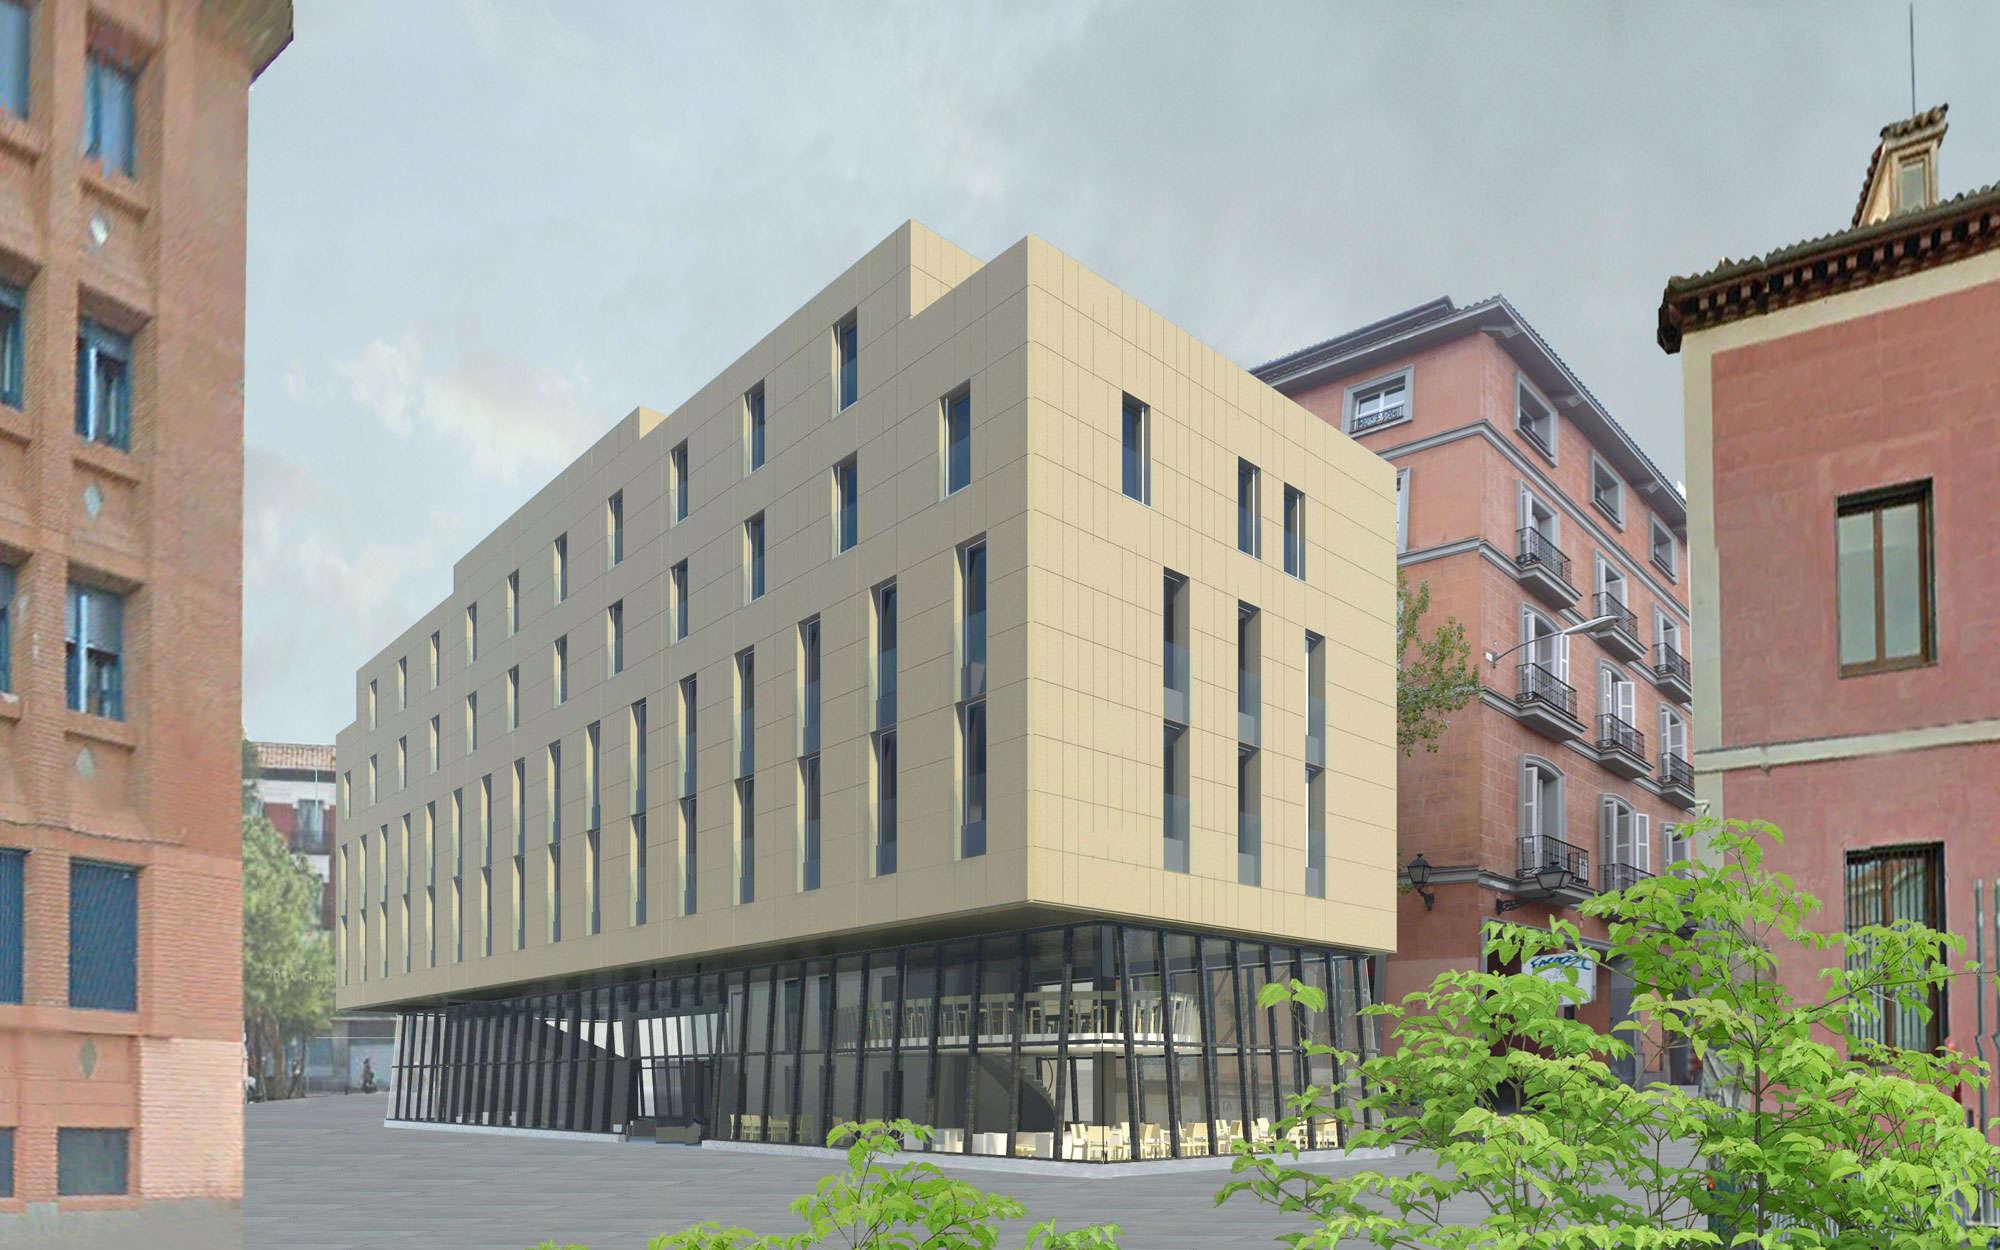 Hostel en calle san mateo en madrid arbau arquitectos - Arquitectos interioristas madrid ...